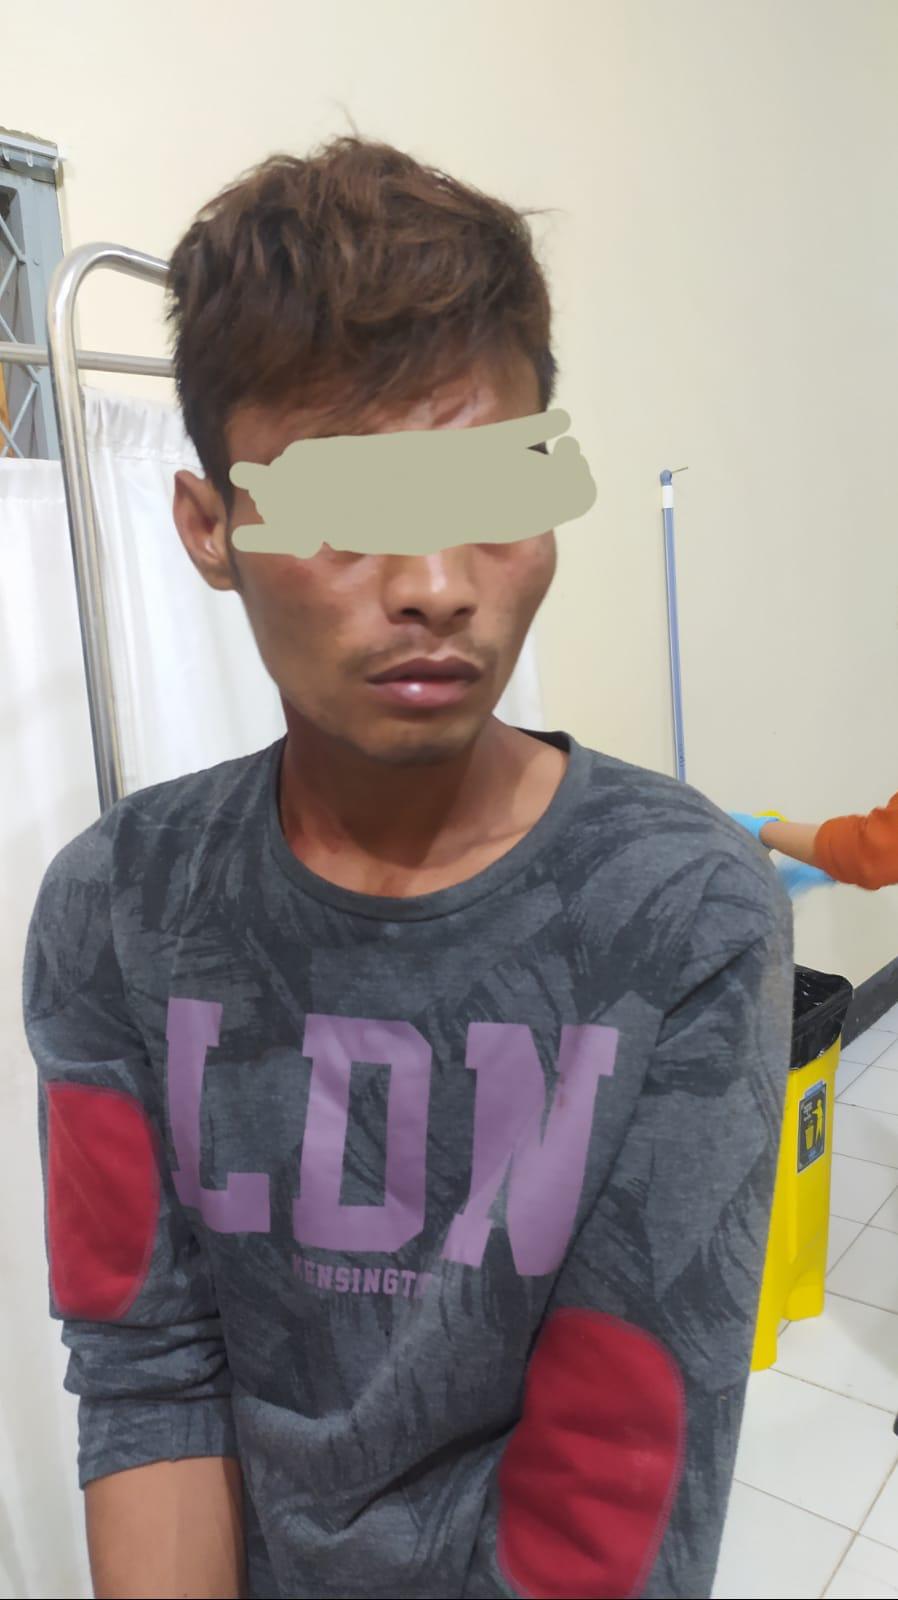 Dua Saudara Kandung di Pulau Bungin Berkelahi, Kepala Sang Kakak Robek